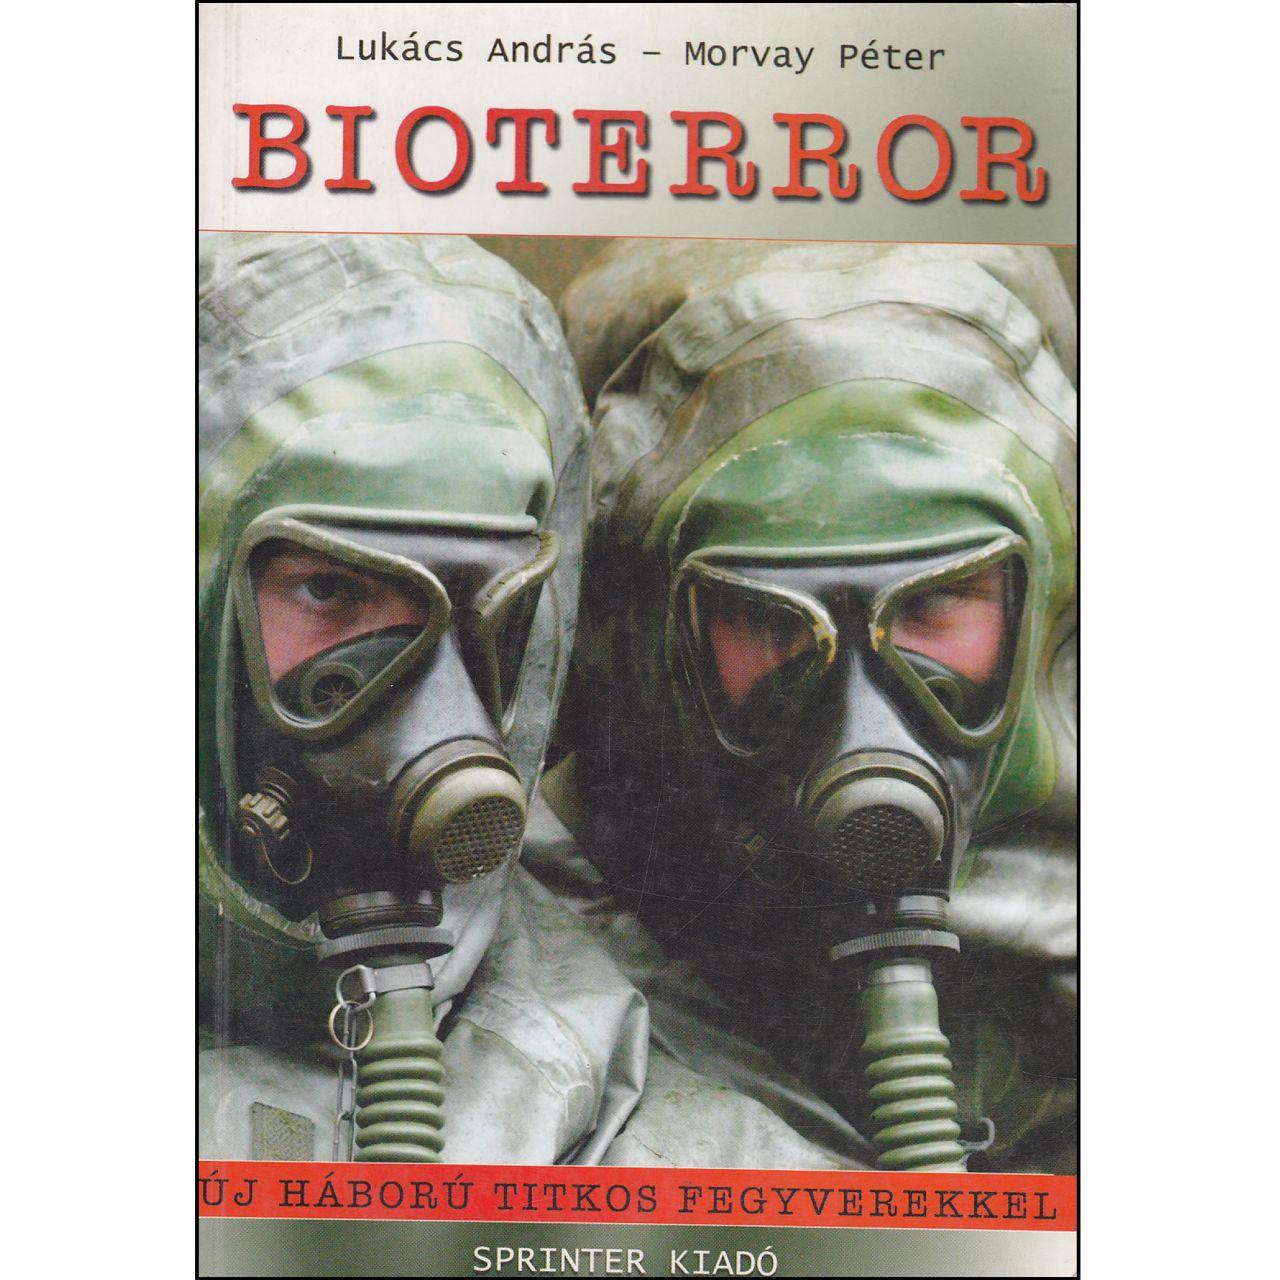 Lukács András – Morvay Péter: Bioterror (könyv)